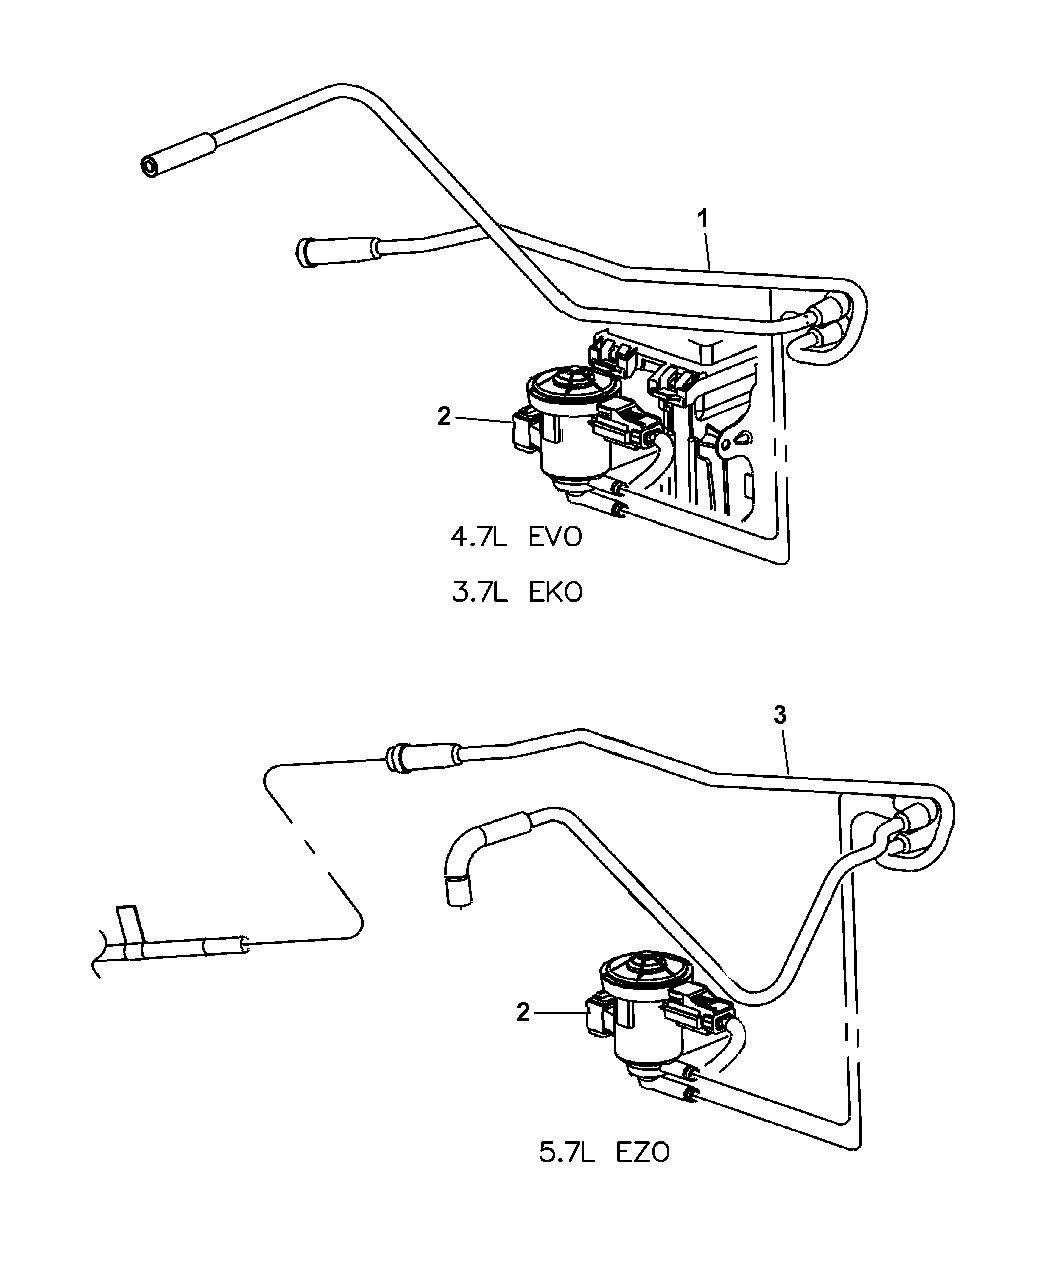 2005 Jeep Grand Cherokee Emission Control Vacuum Harness